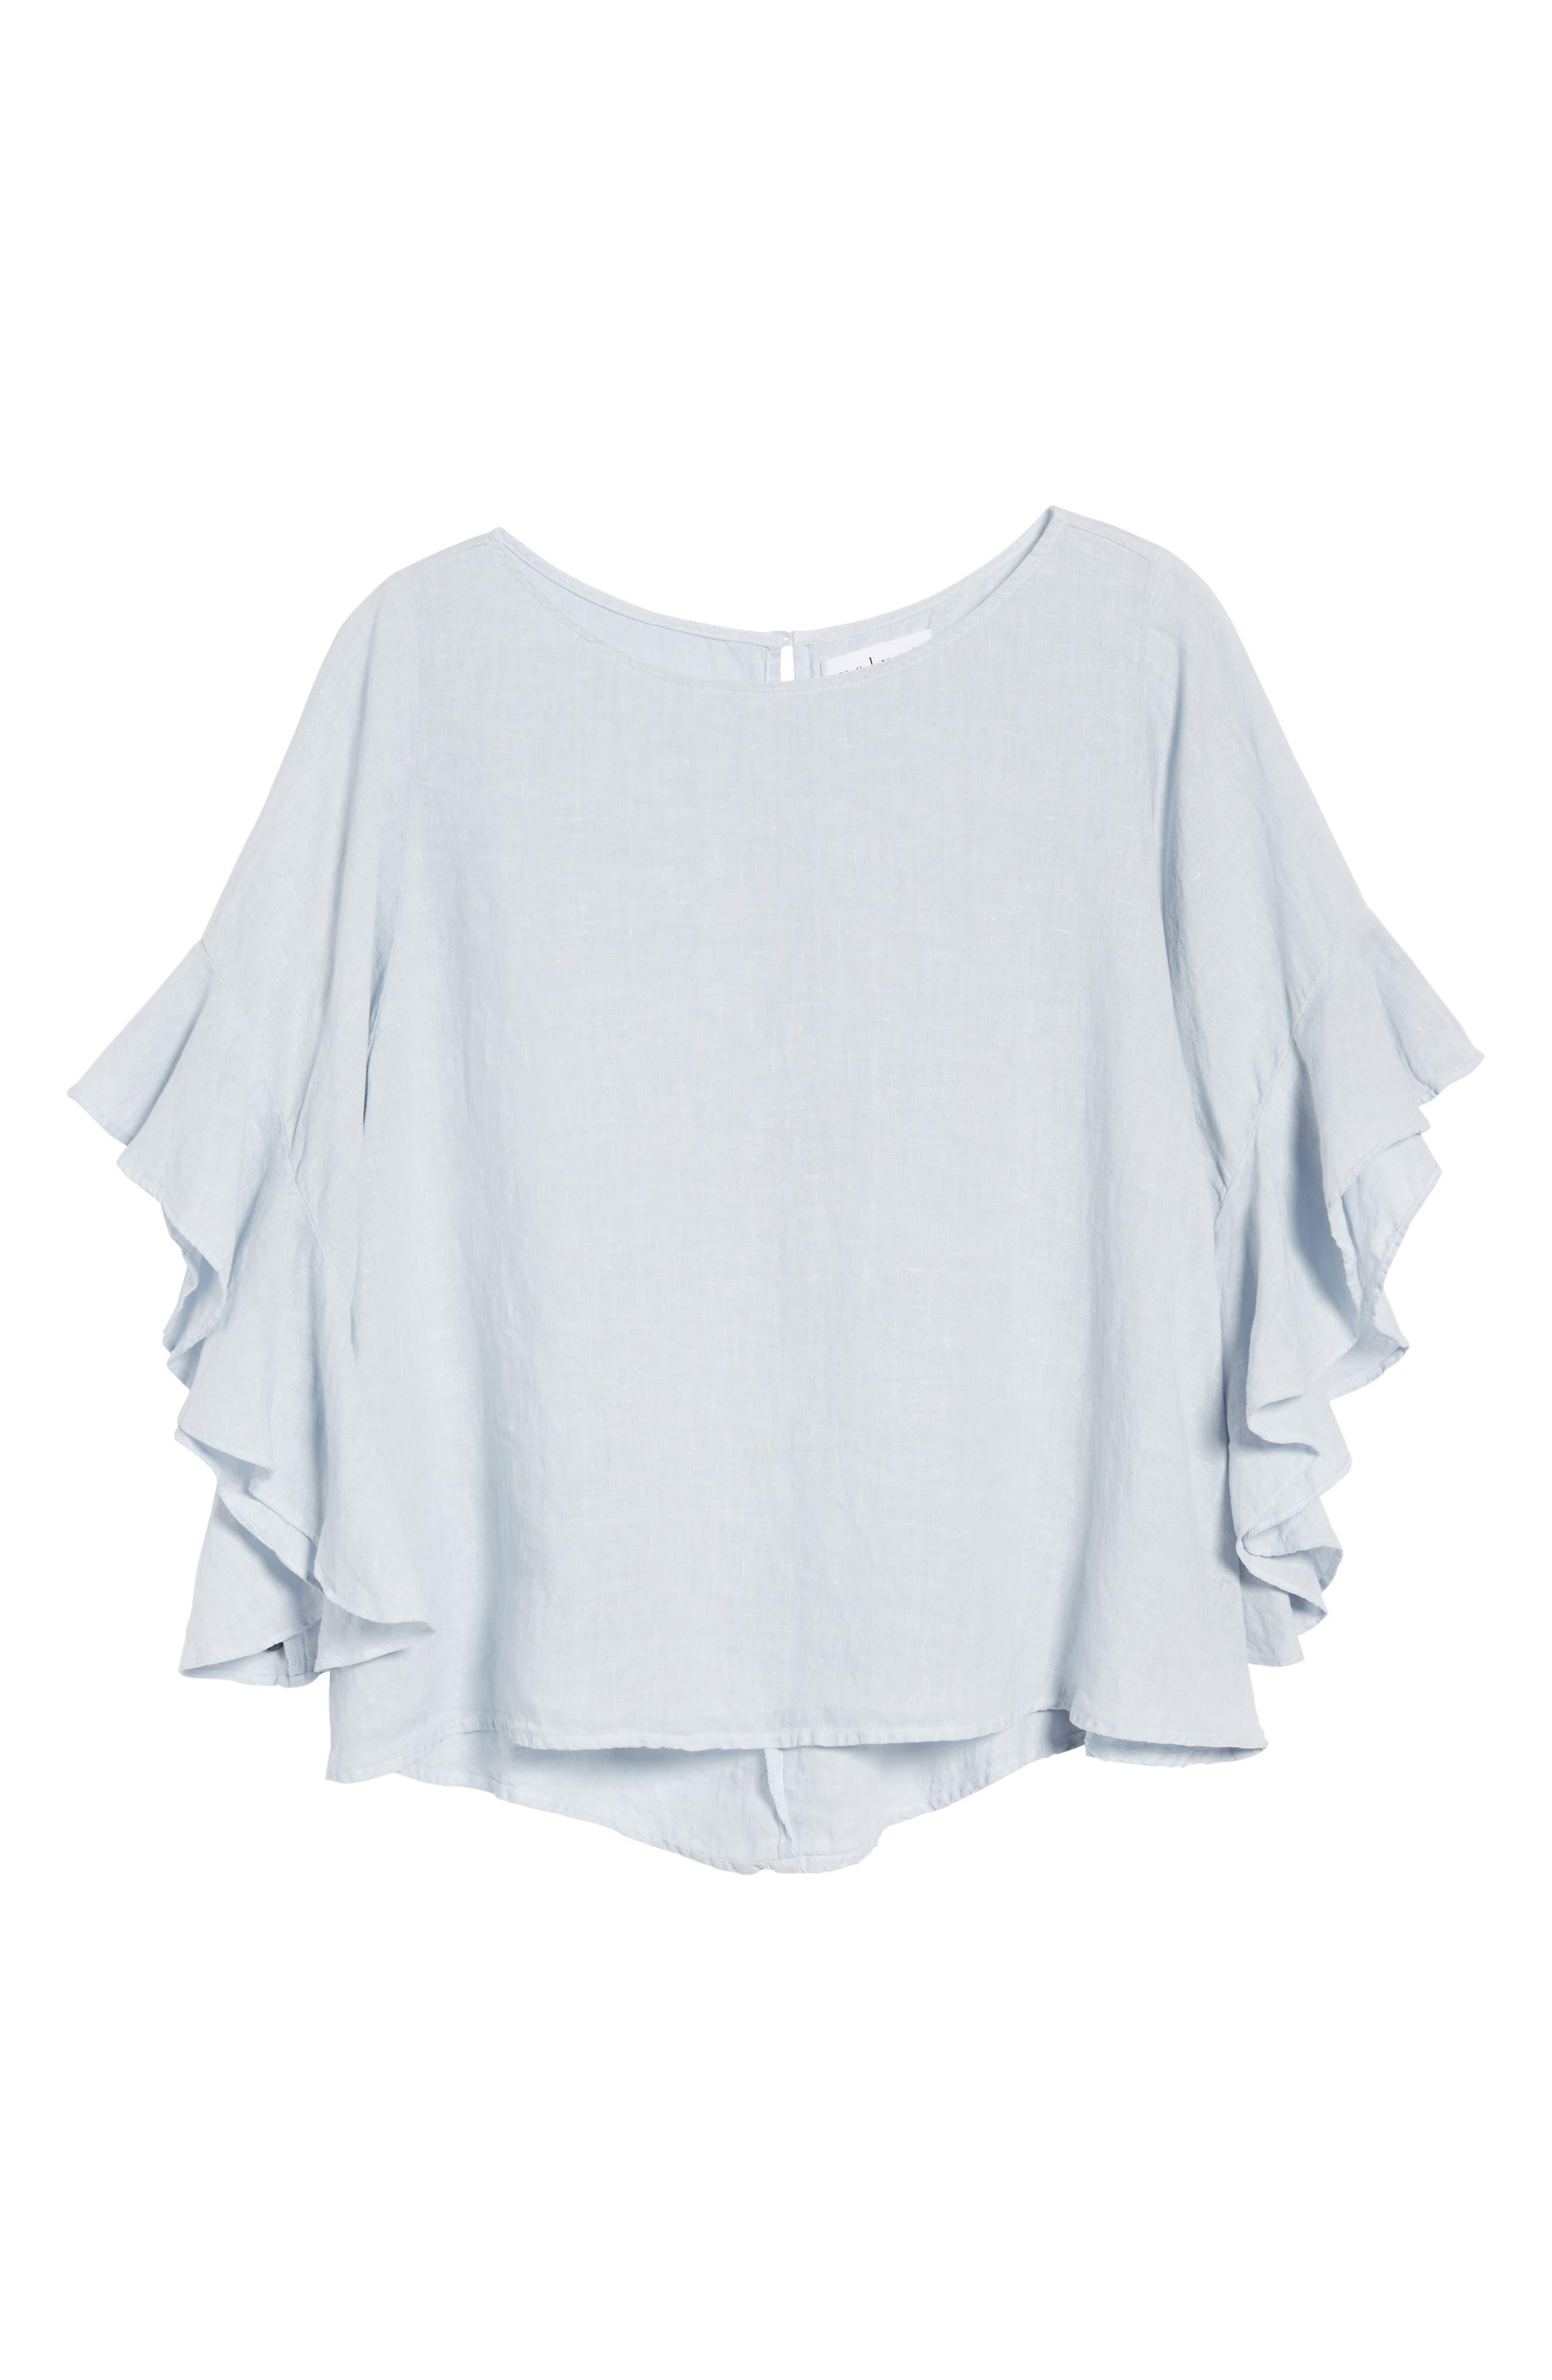 Ruffle Sleeve Linen Top,                             Alternate thumbnail 8, color,                             Cloud